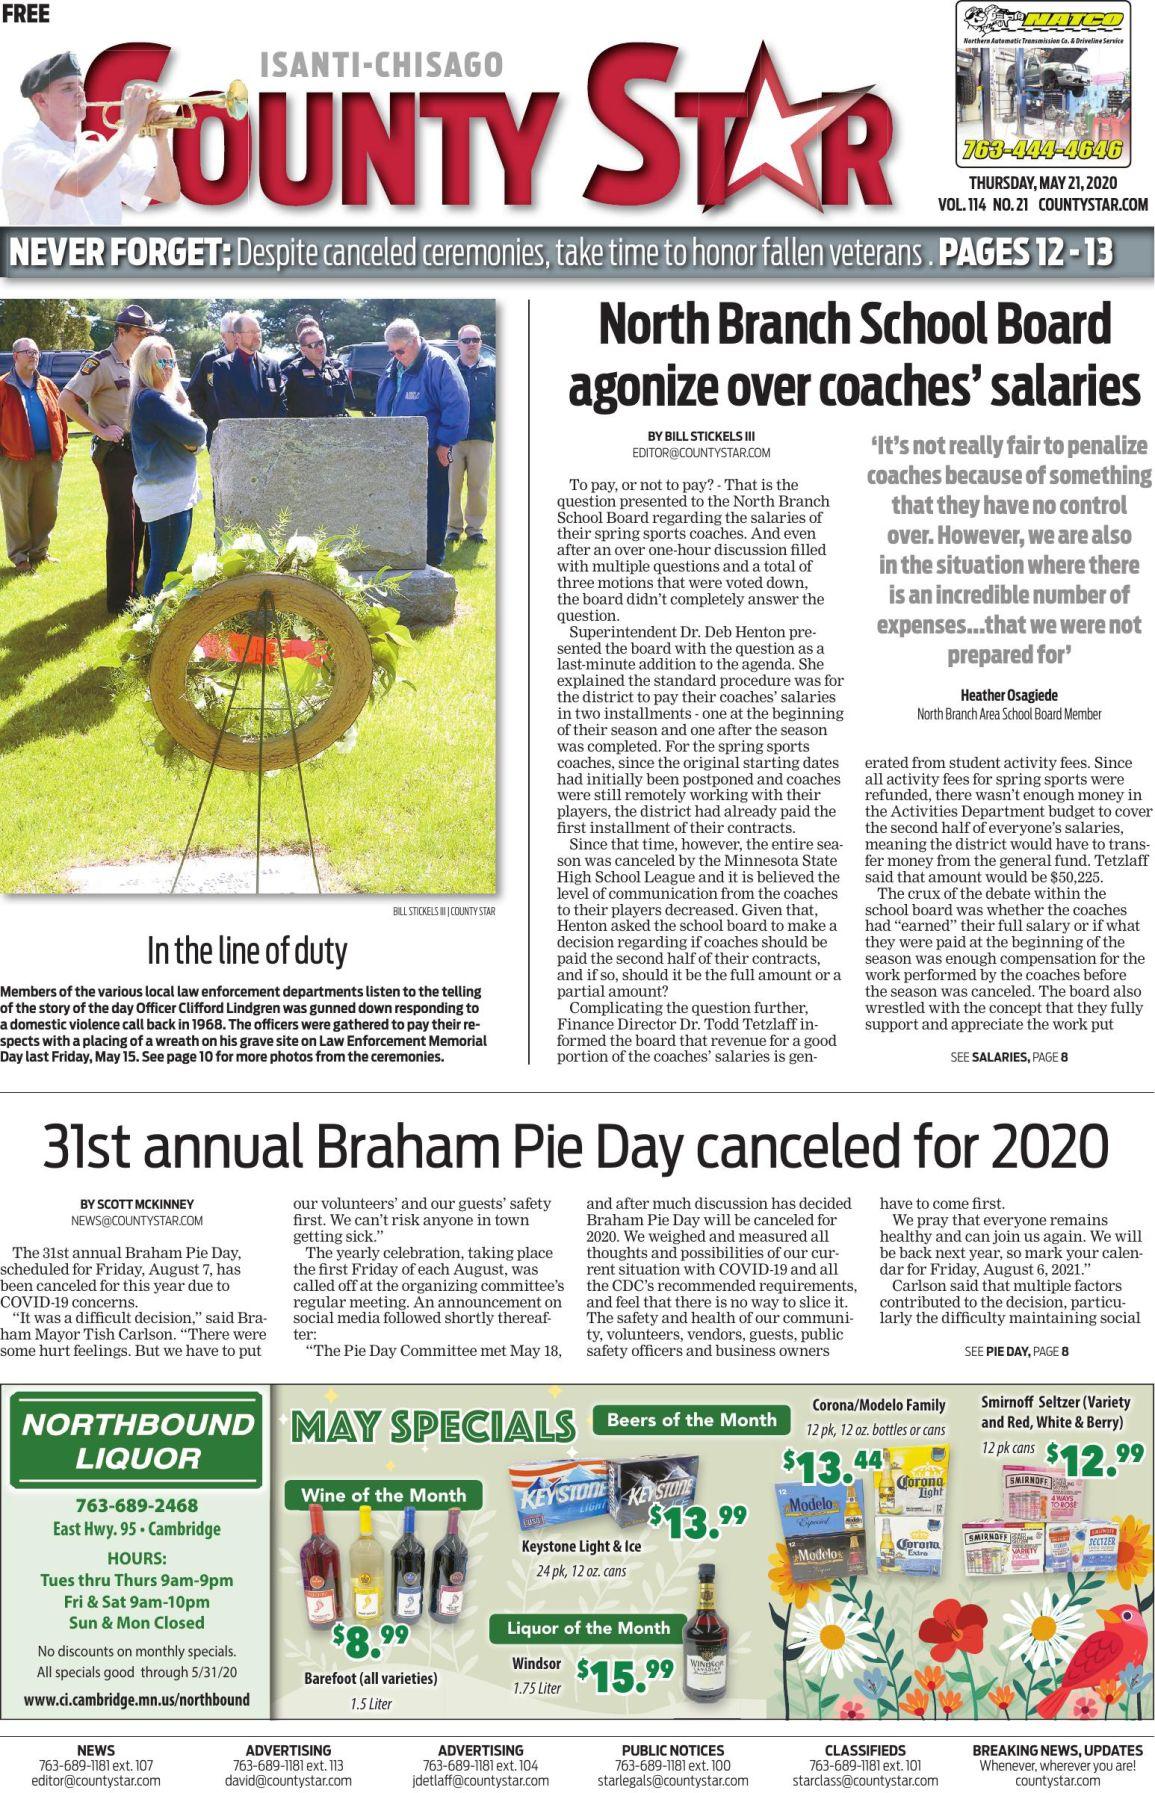 Isanti-Chisago County Star May 21, 2020 e-edition